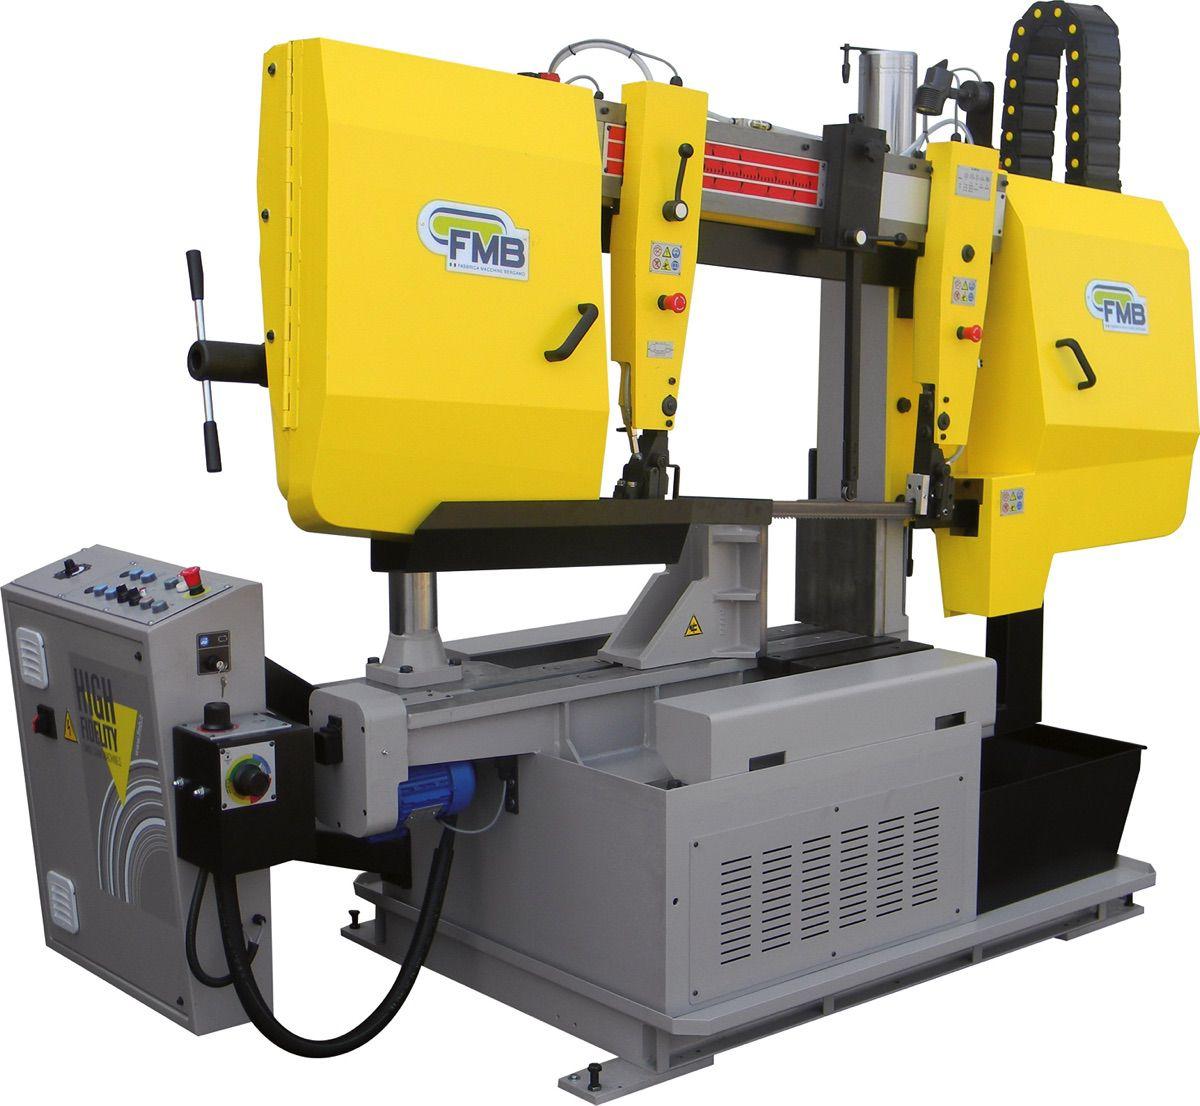 fmb olimpus 1 halfautomatische lintzaagmachine